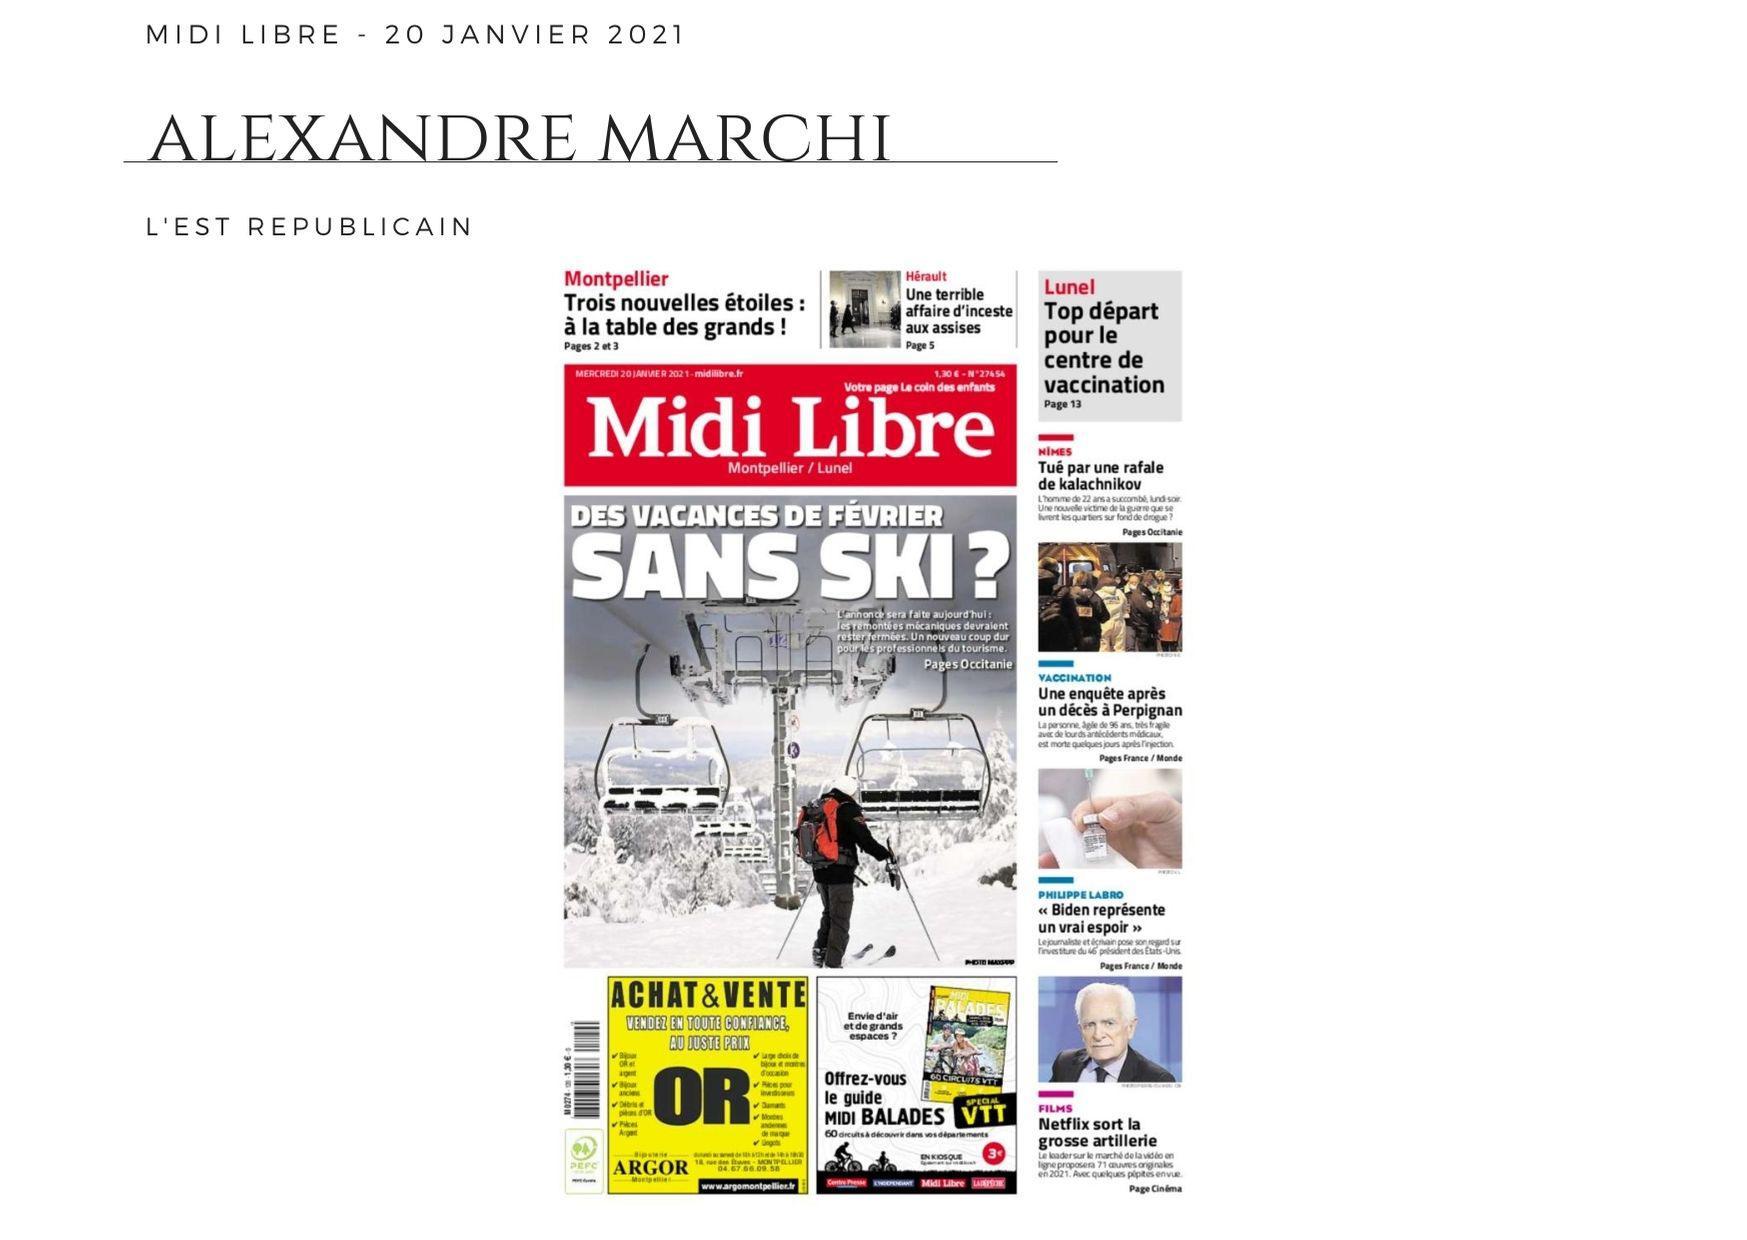 Midi Libre - 20 janvier 2021